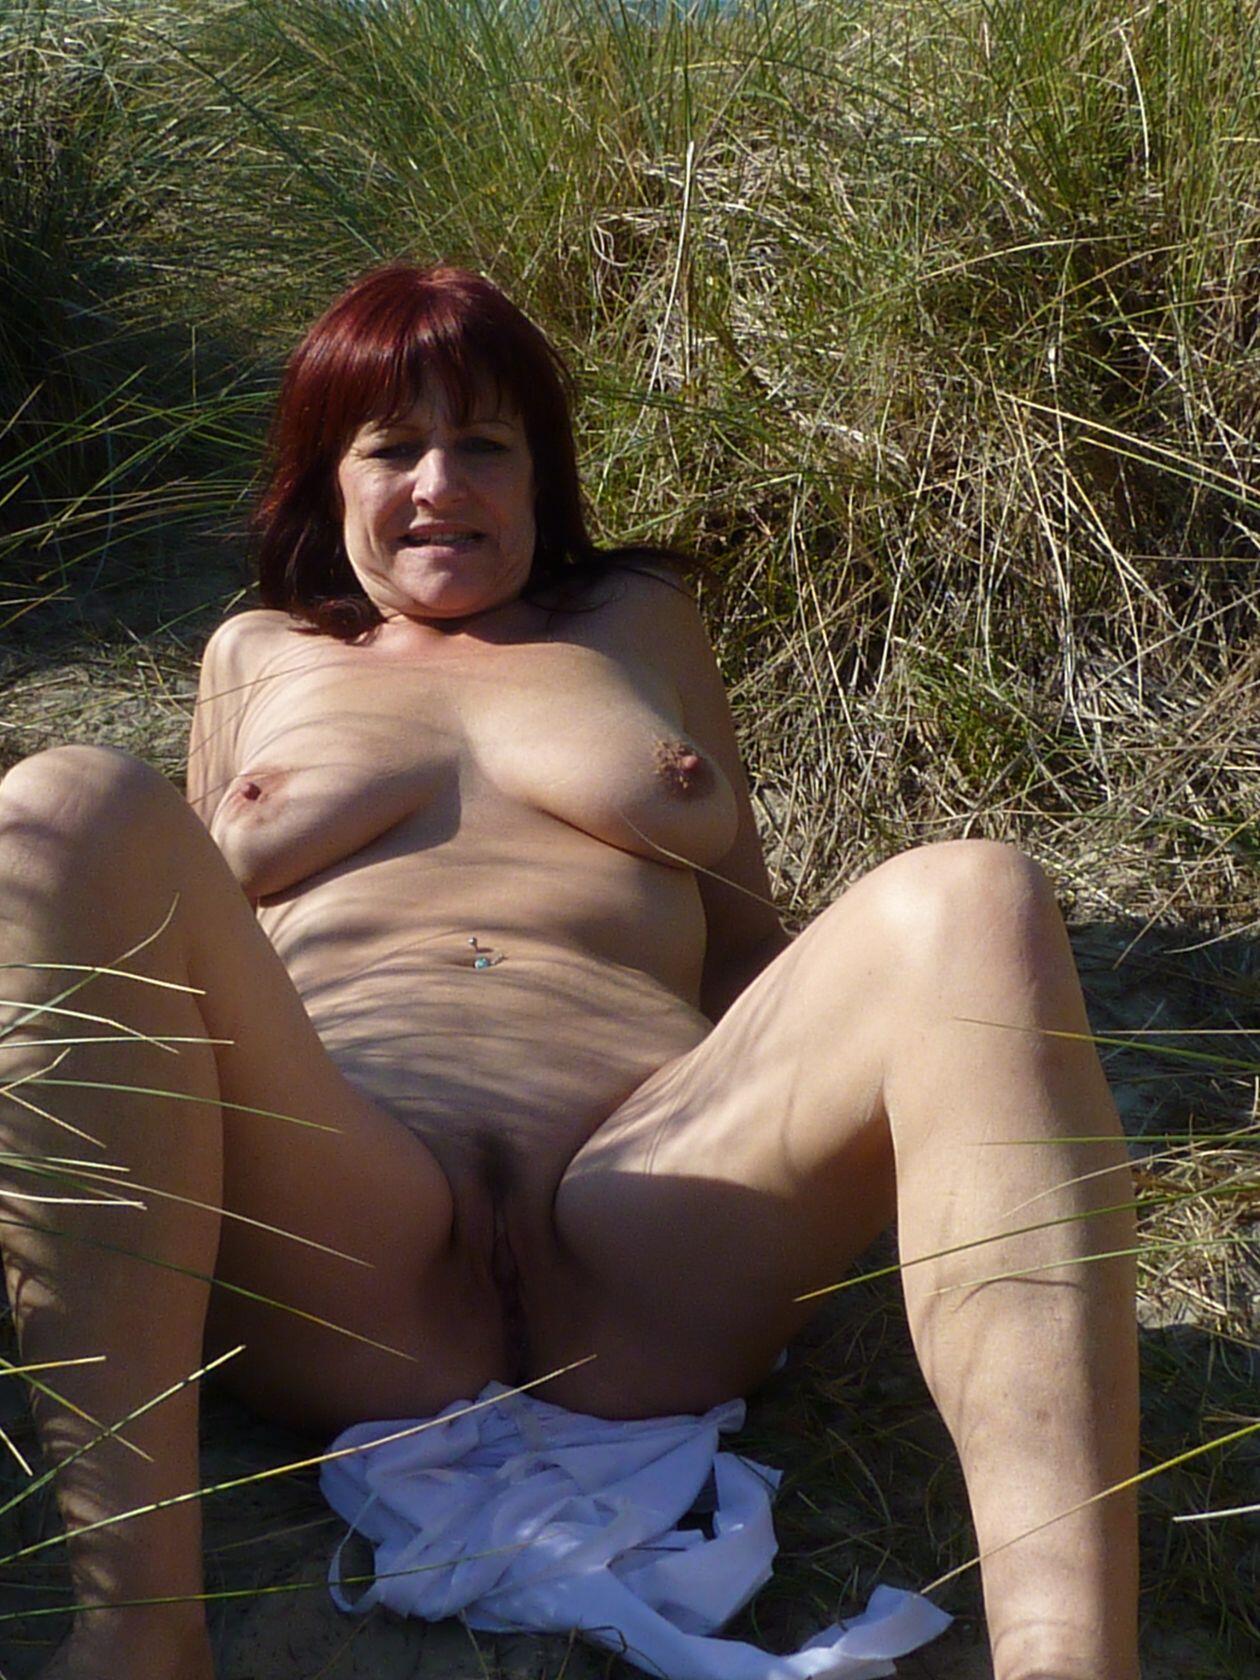 Milf slut goes naked on the beach. real nudity